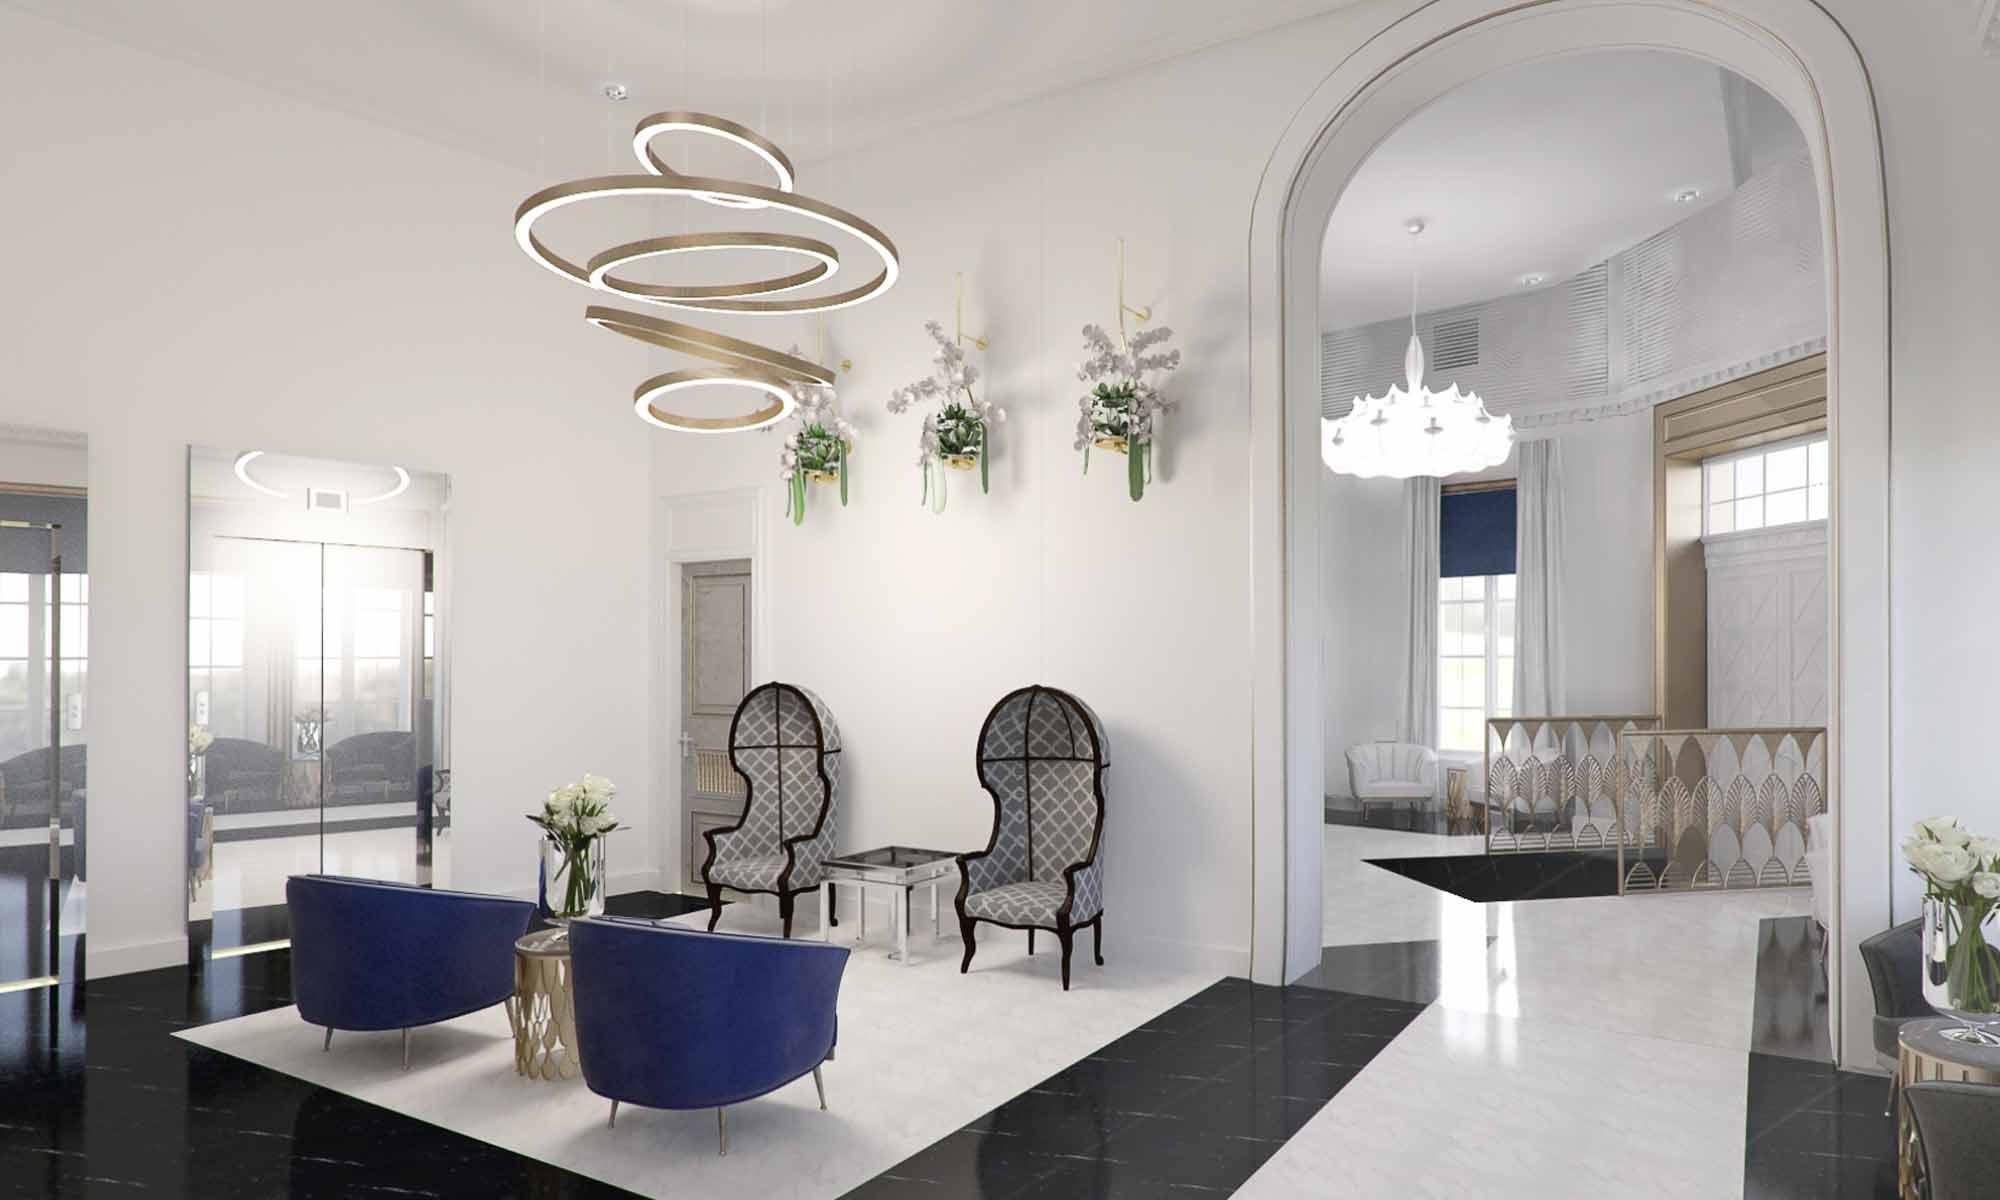 Hotel room bucharest new york industrial loft design for A for art design hotel